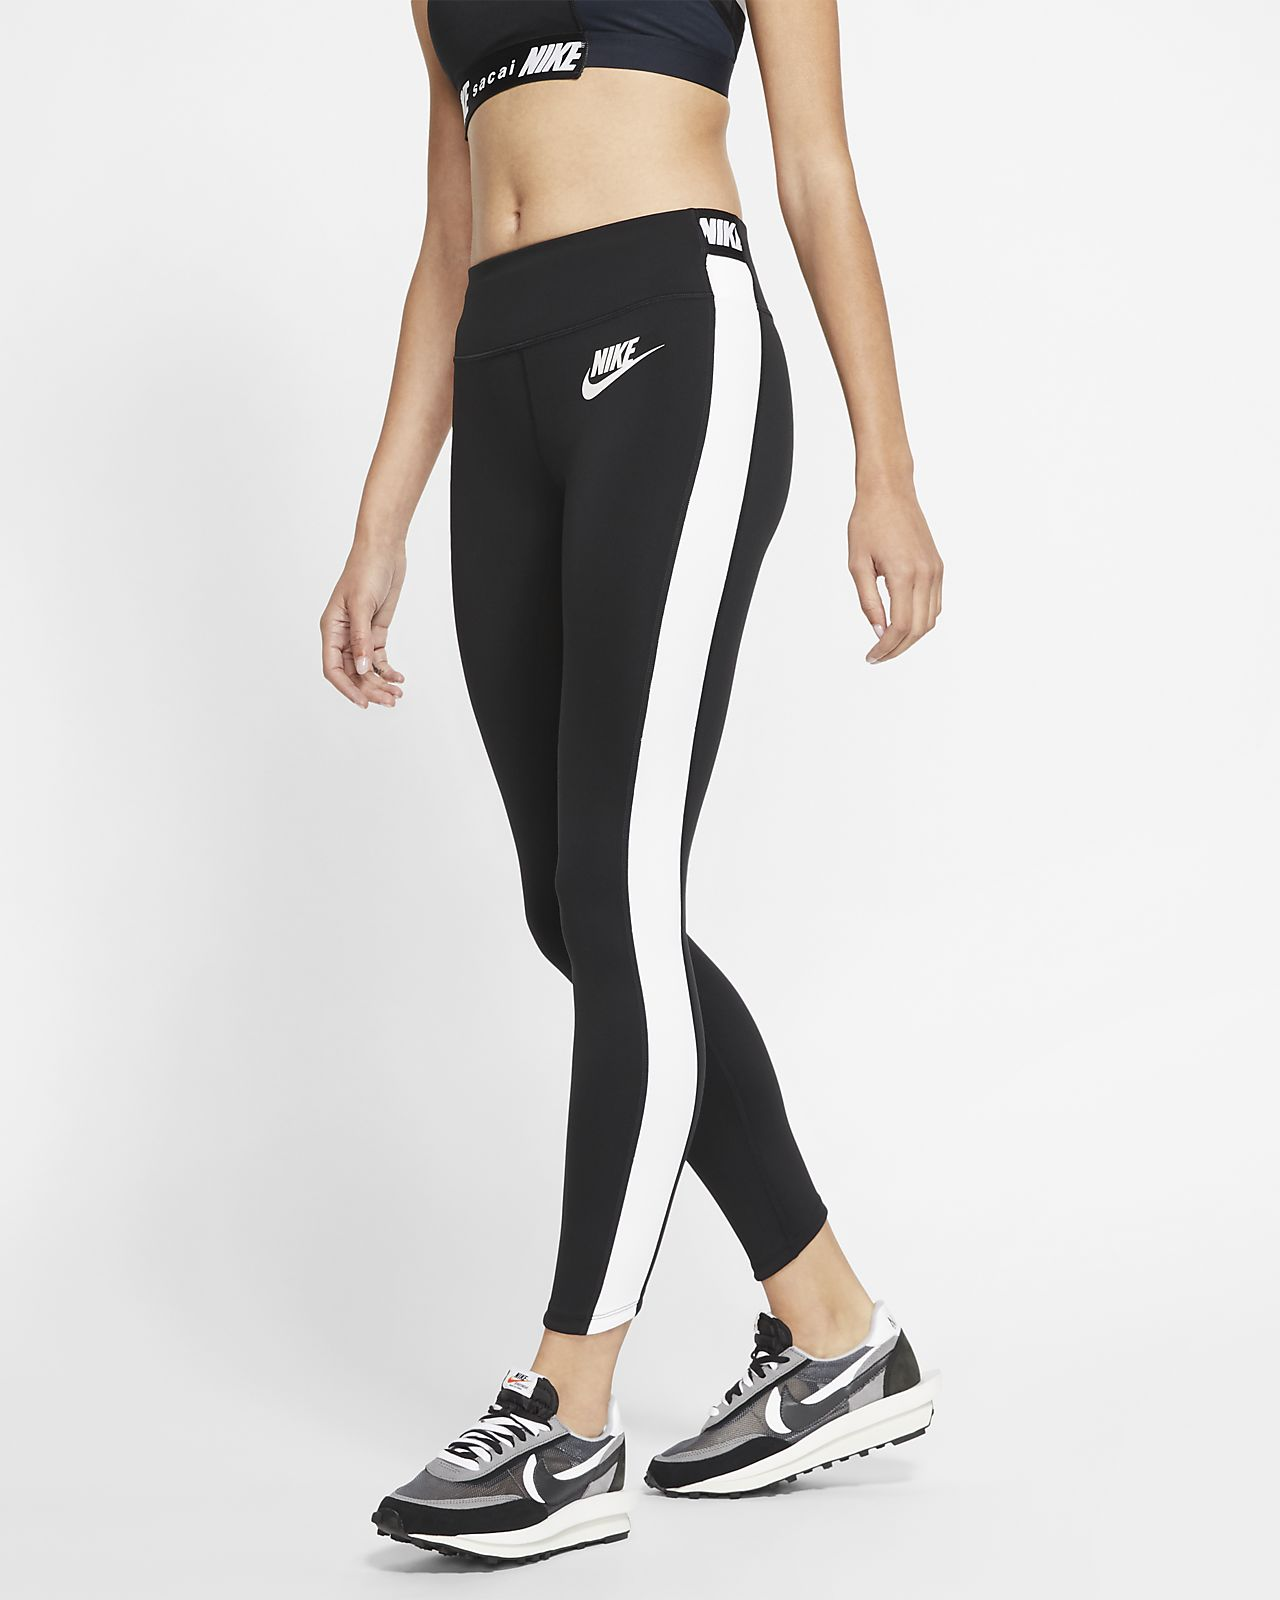 top quality info for no sale tax Nike x Sacai Lauf-Tights für Damen